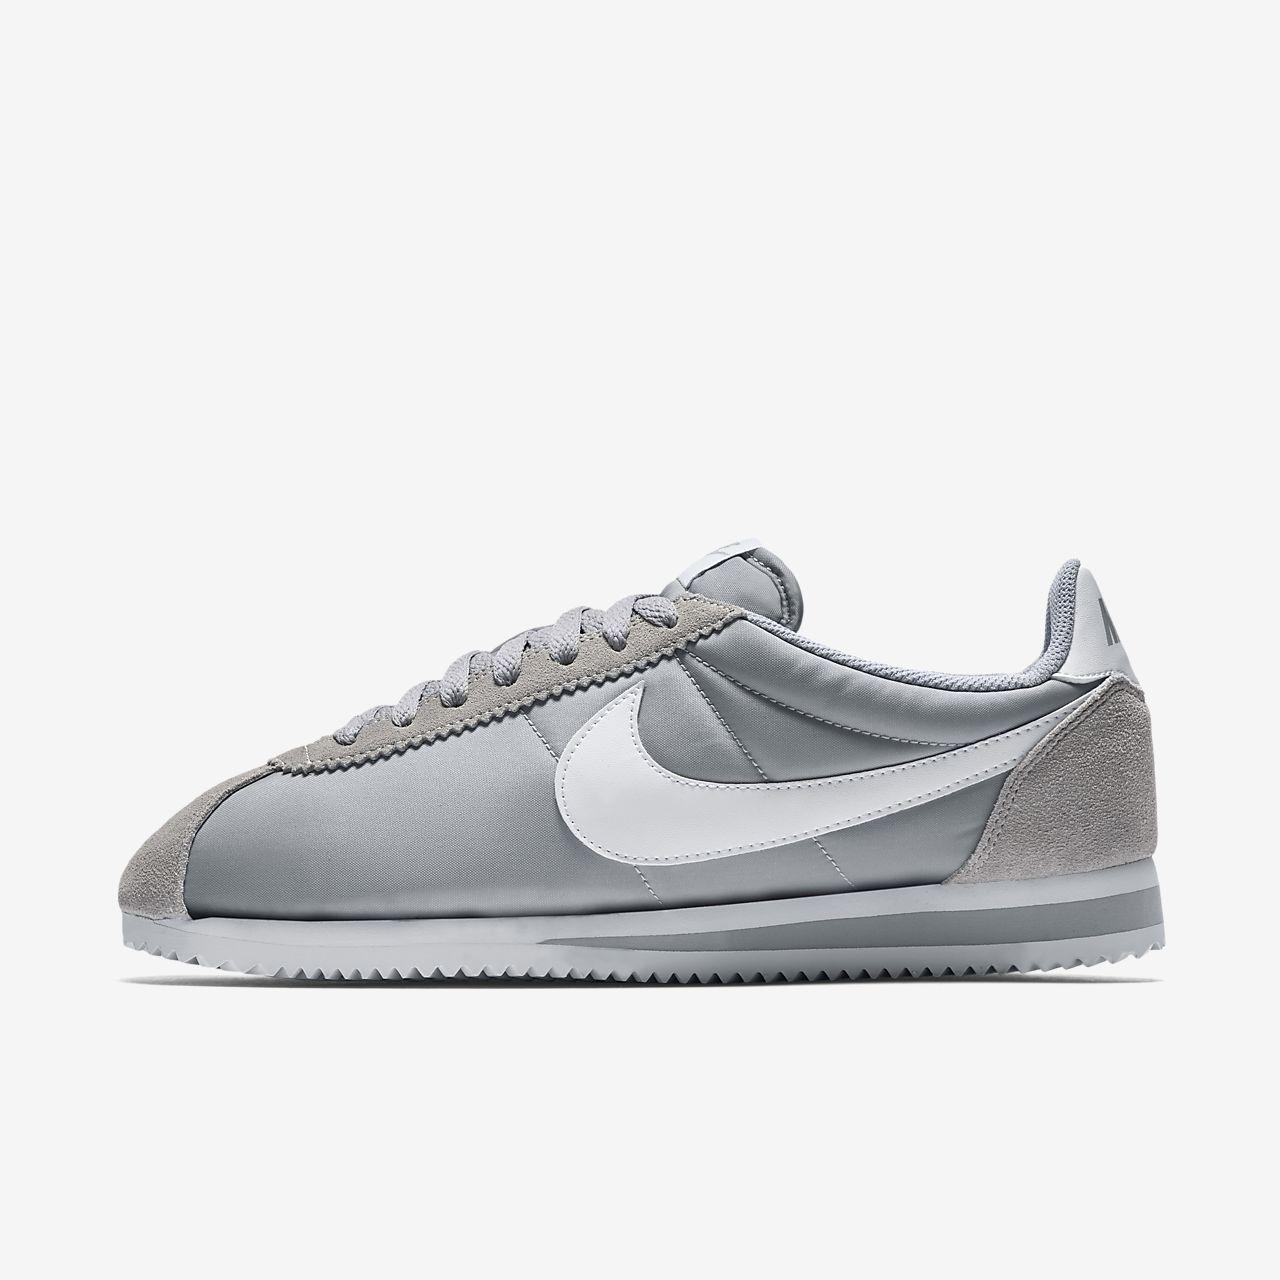 new styles 3148b b0e5c ... Chaussure mixte Nike Classic Cortez Nylon